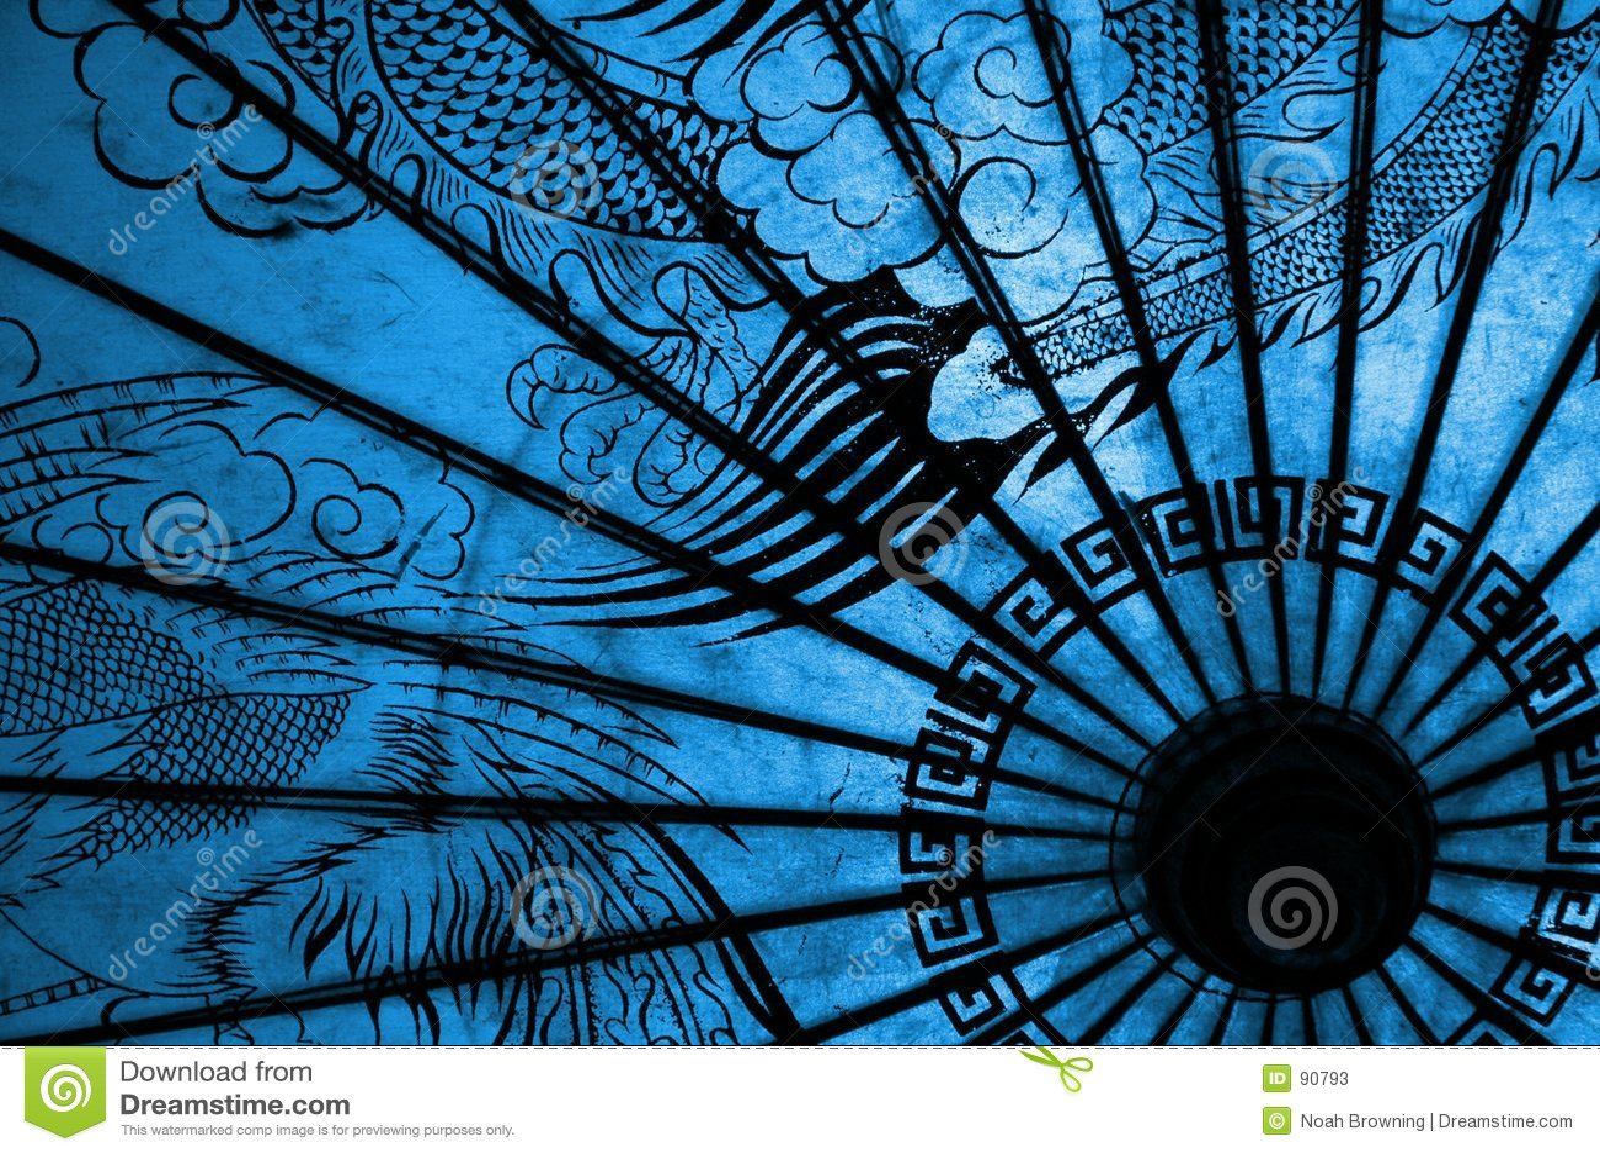 oriental umbrella stock image image of life asian blue 90793